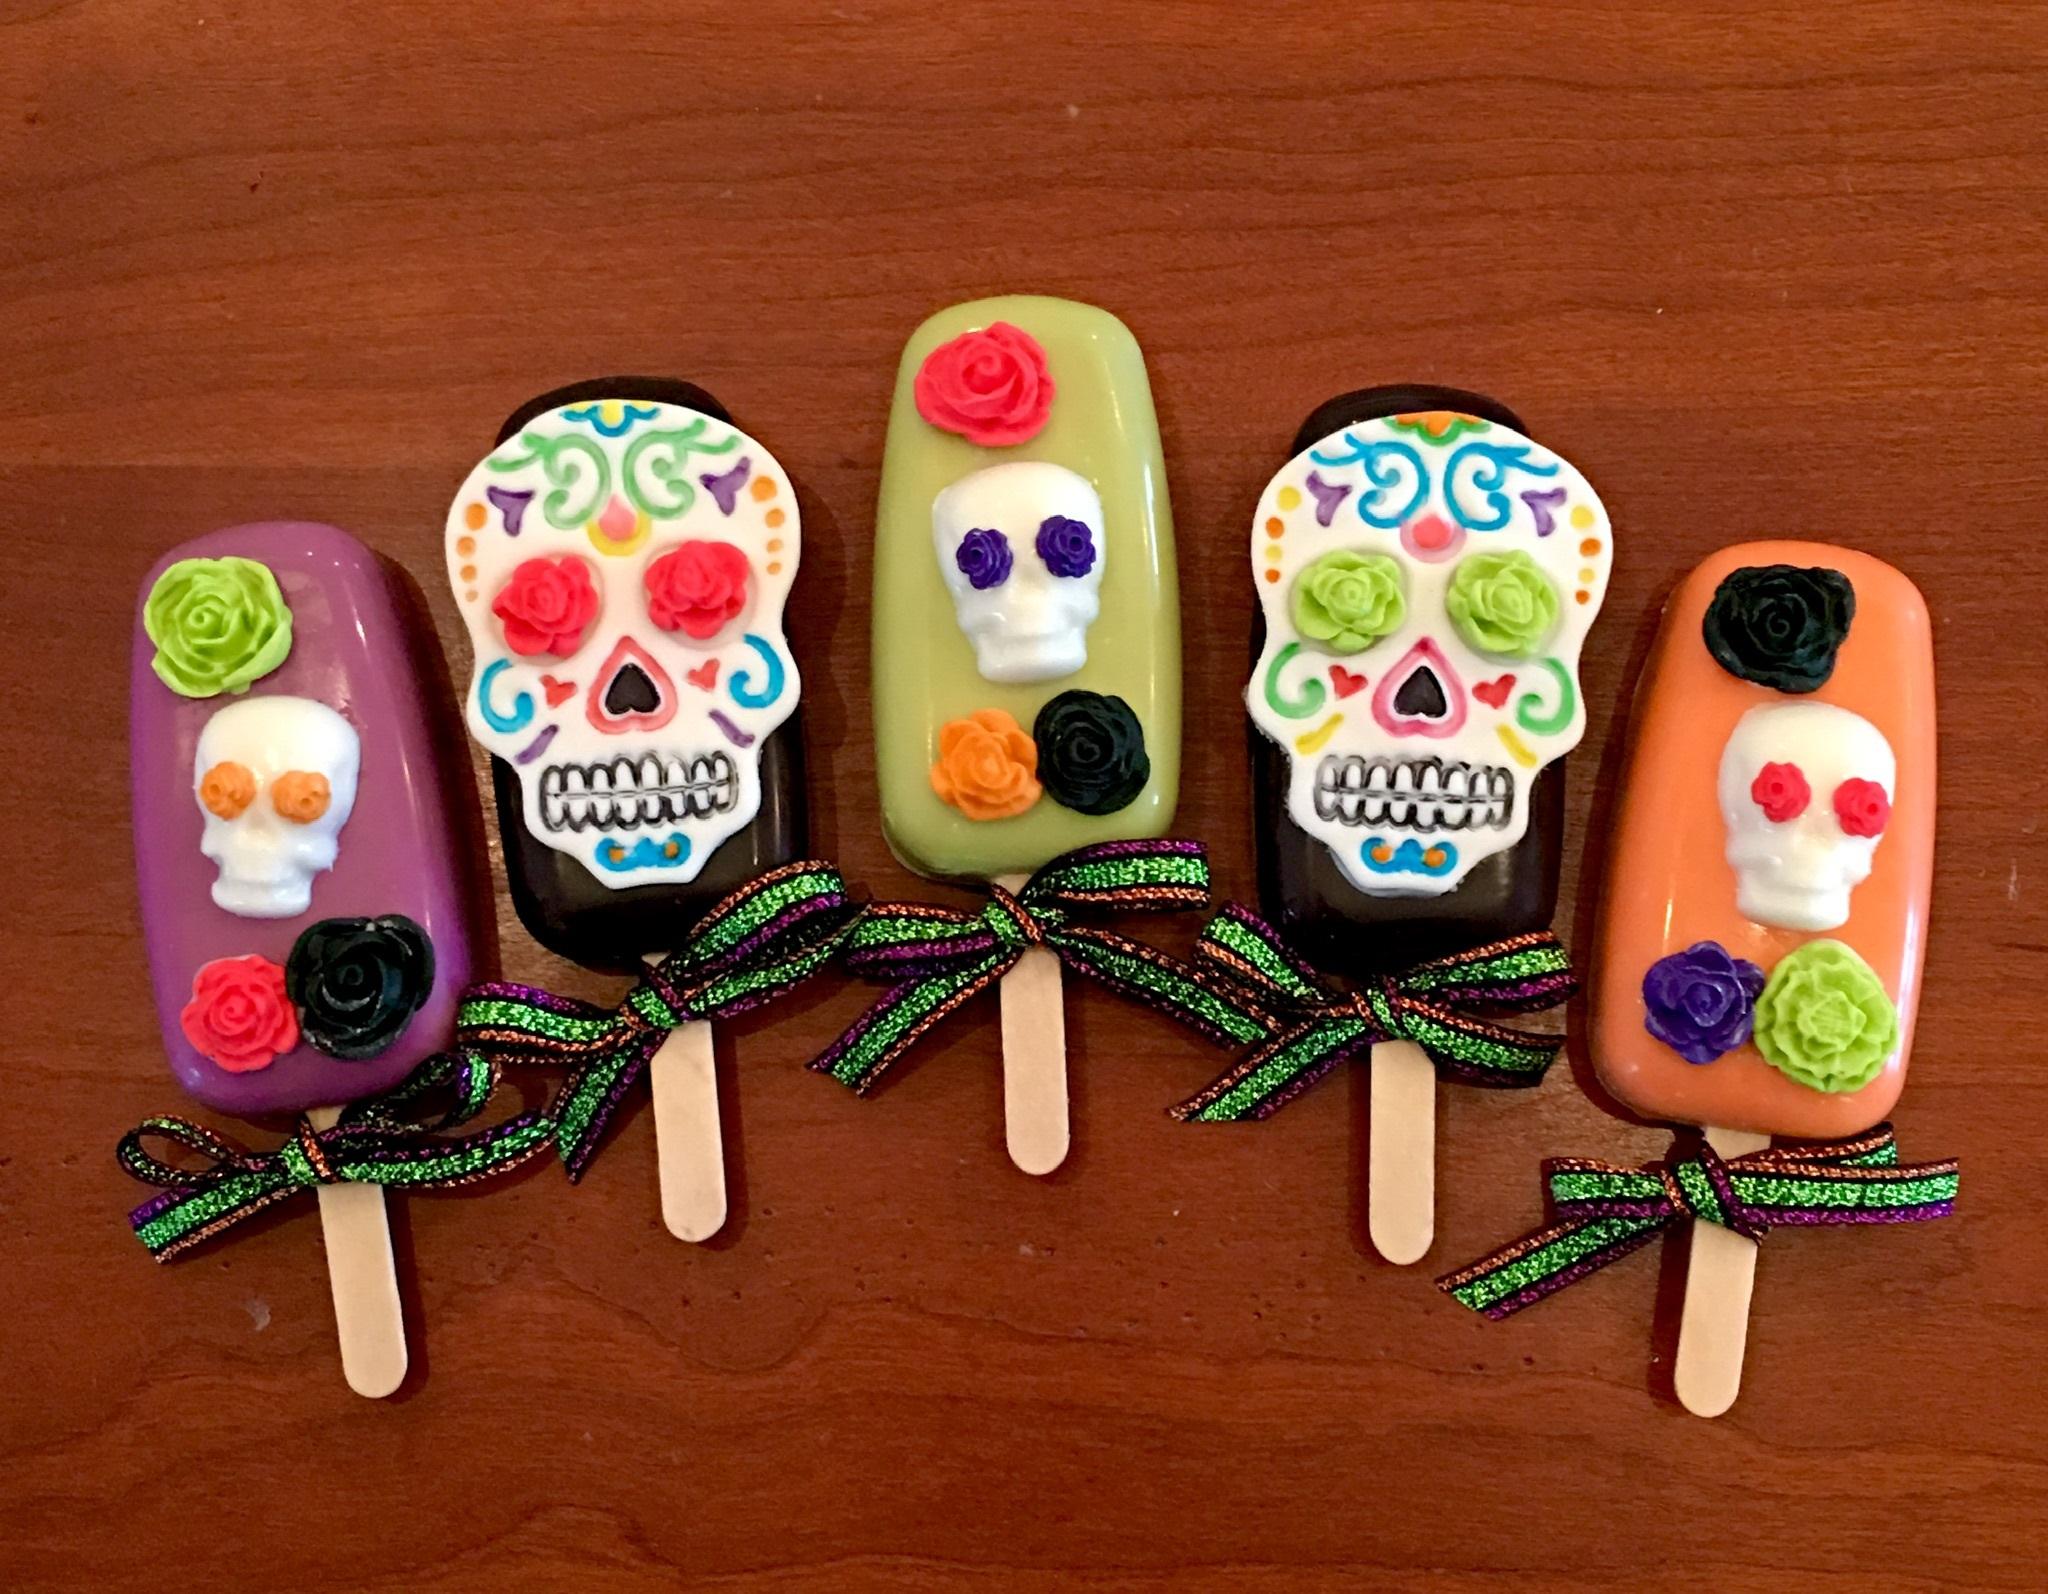 Cakesicles 101 – Dia de los Muertos Edition